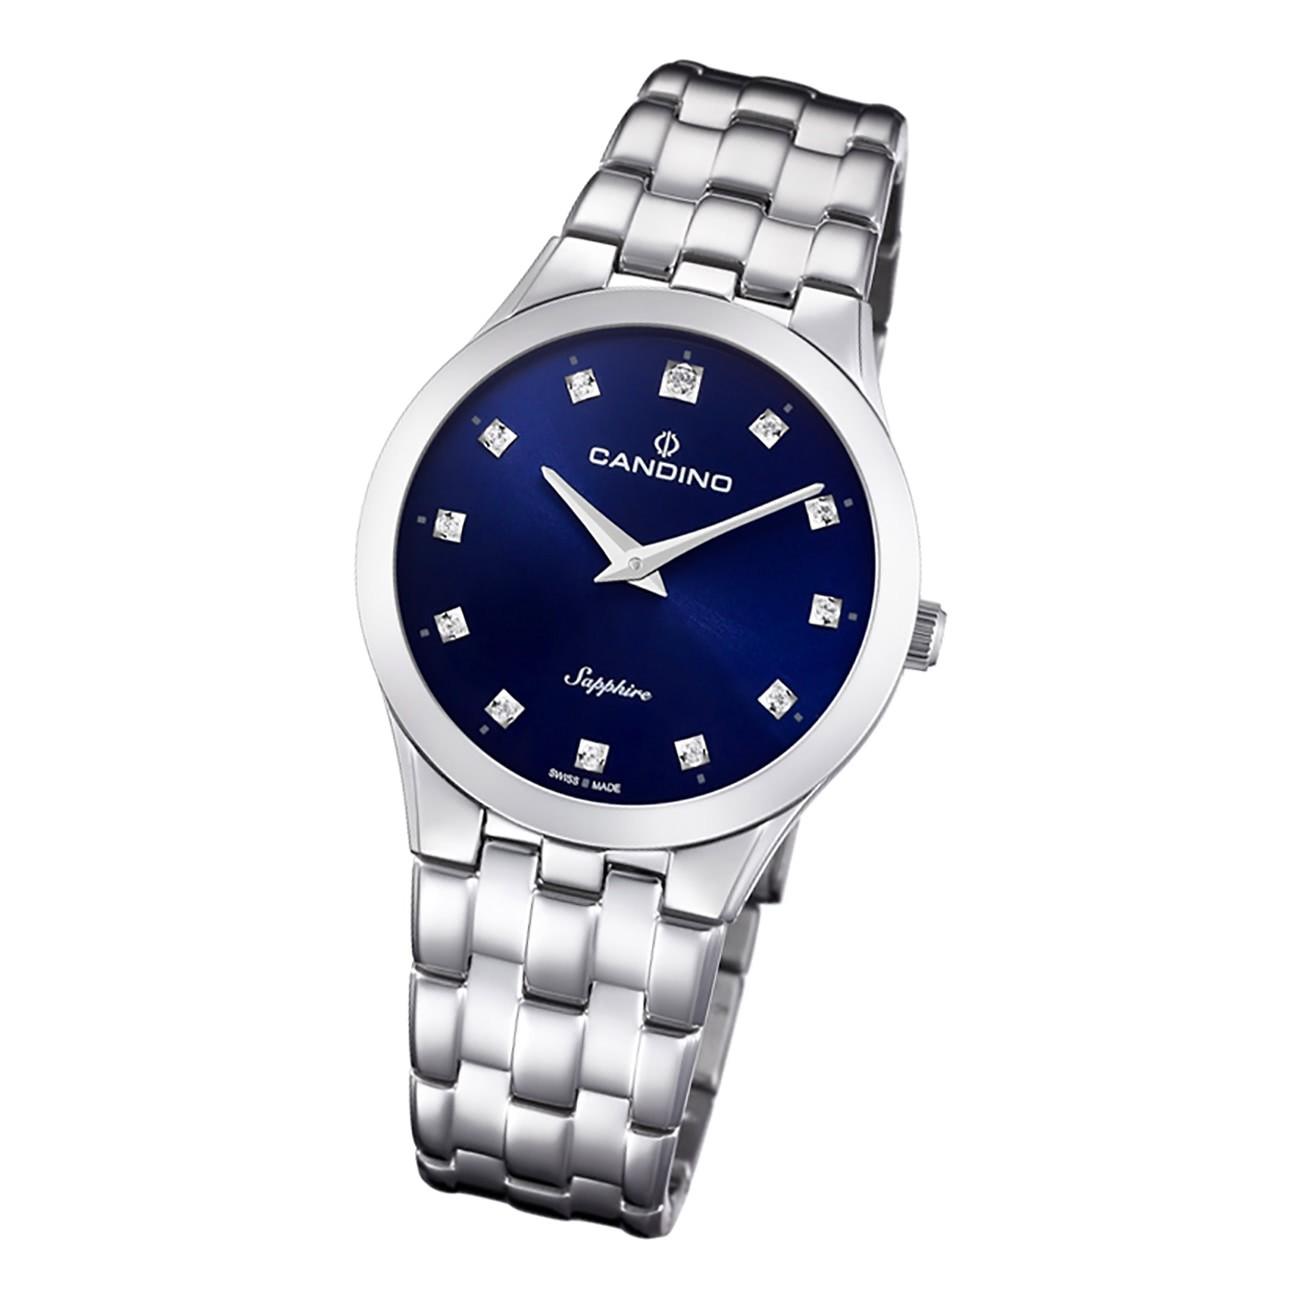 Candino Damen Armbanduhr Classic C4700/2 Analog Edelstahl silber UC4700/2